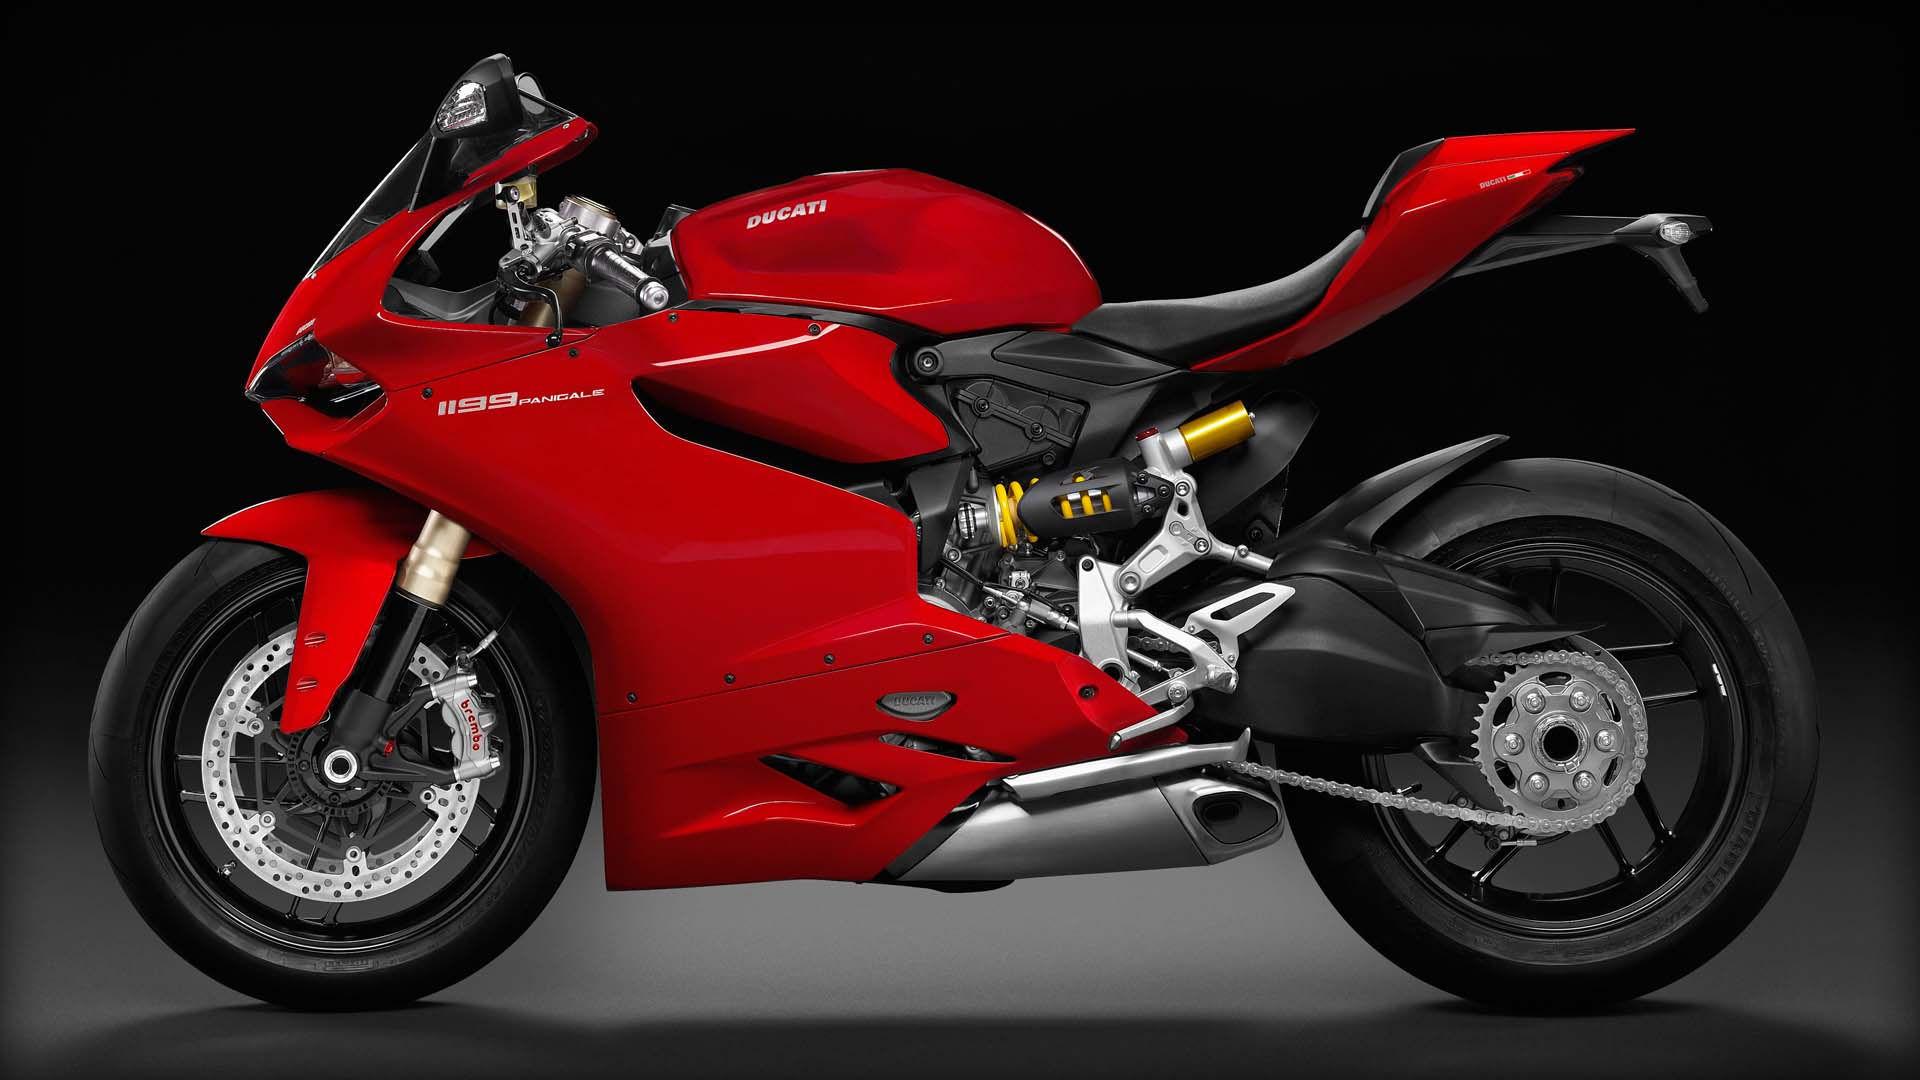 2014 Ducati 1199 PANIGALE | Ducati 1199 Panigale - Side Profile